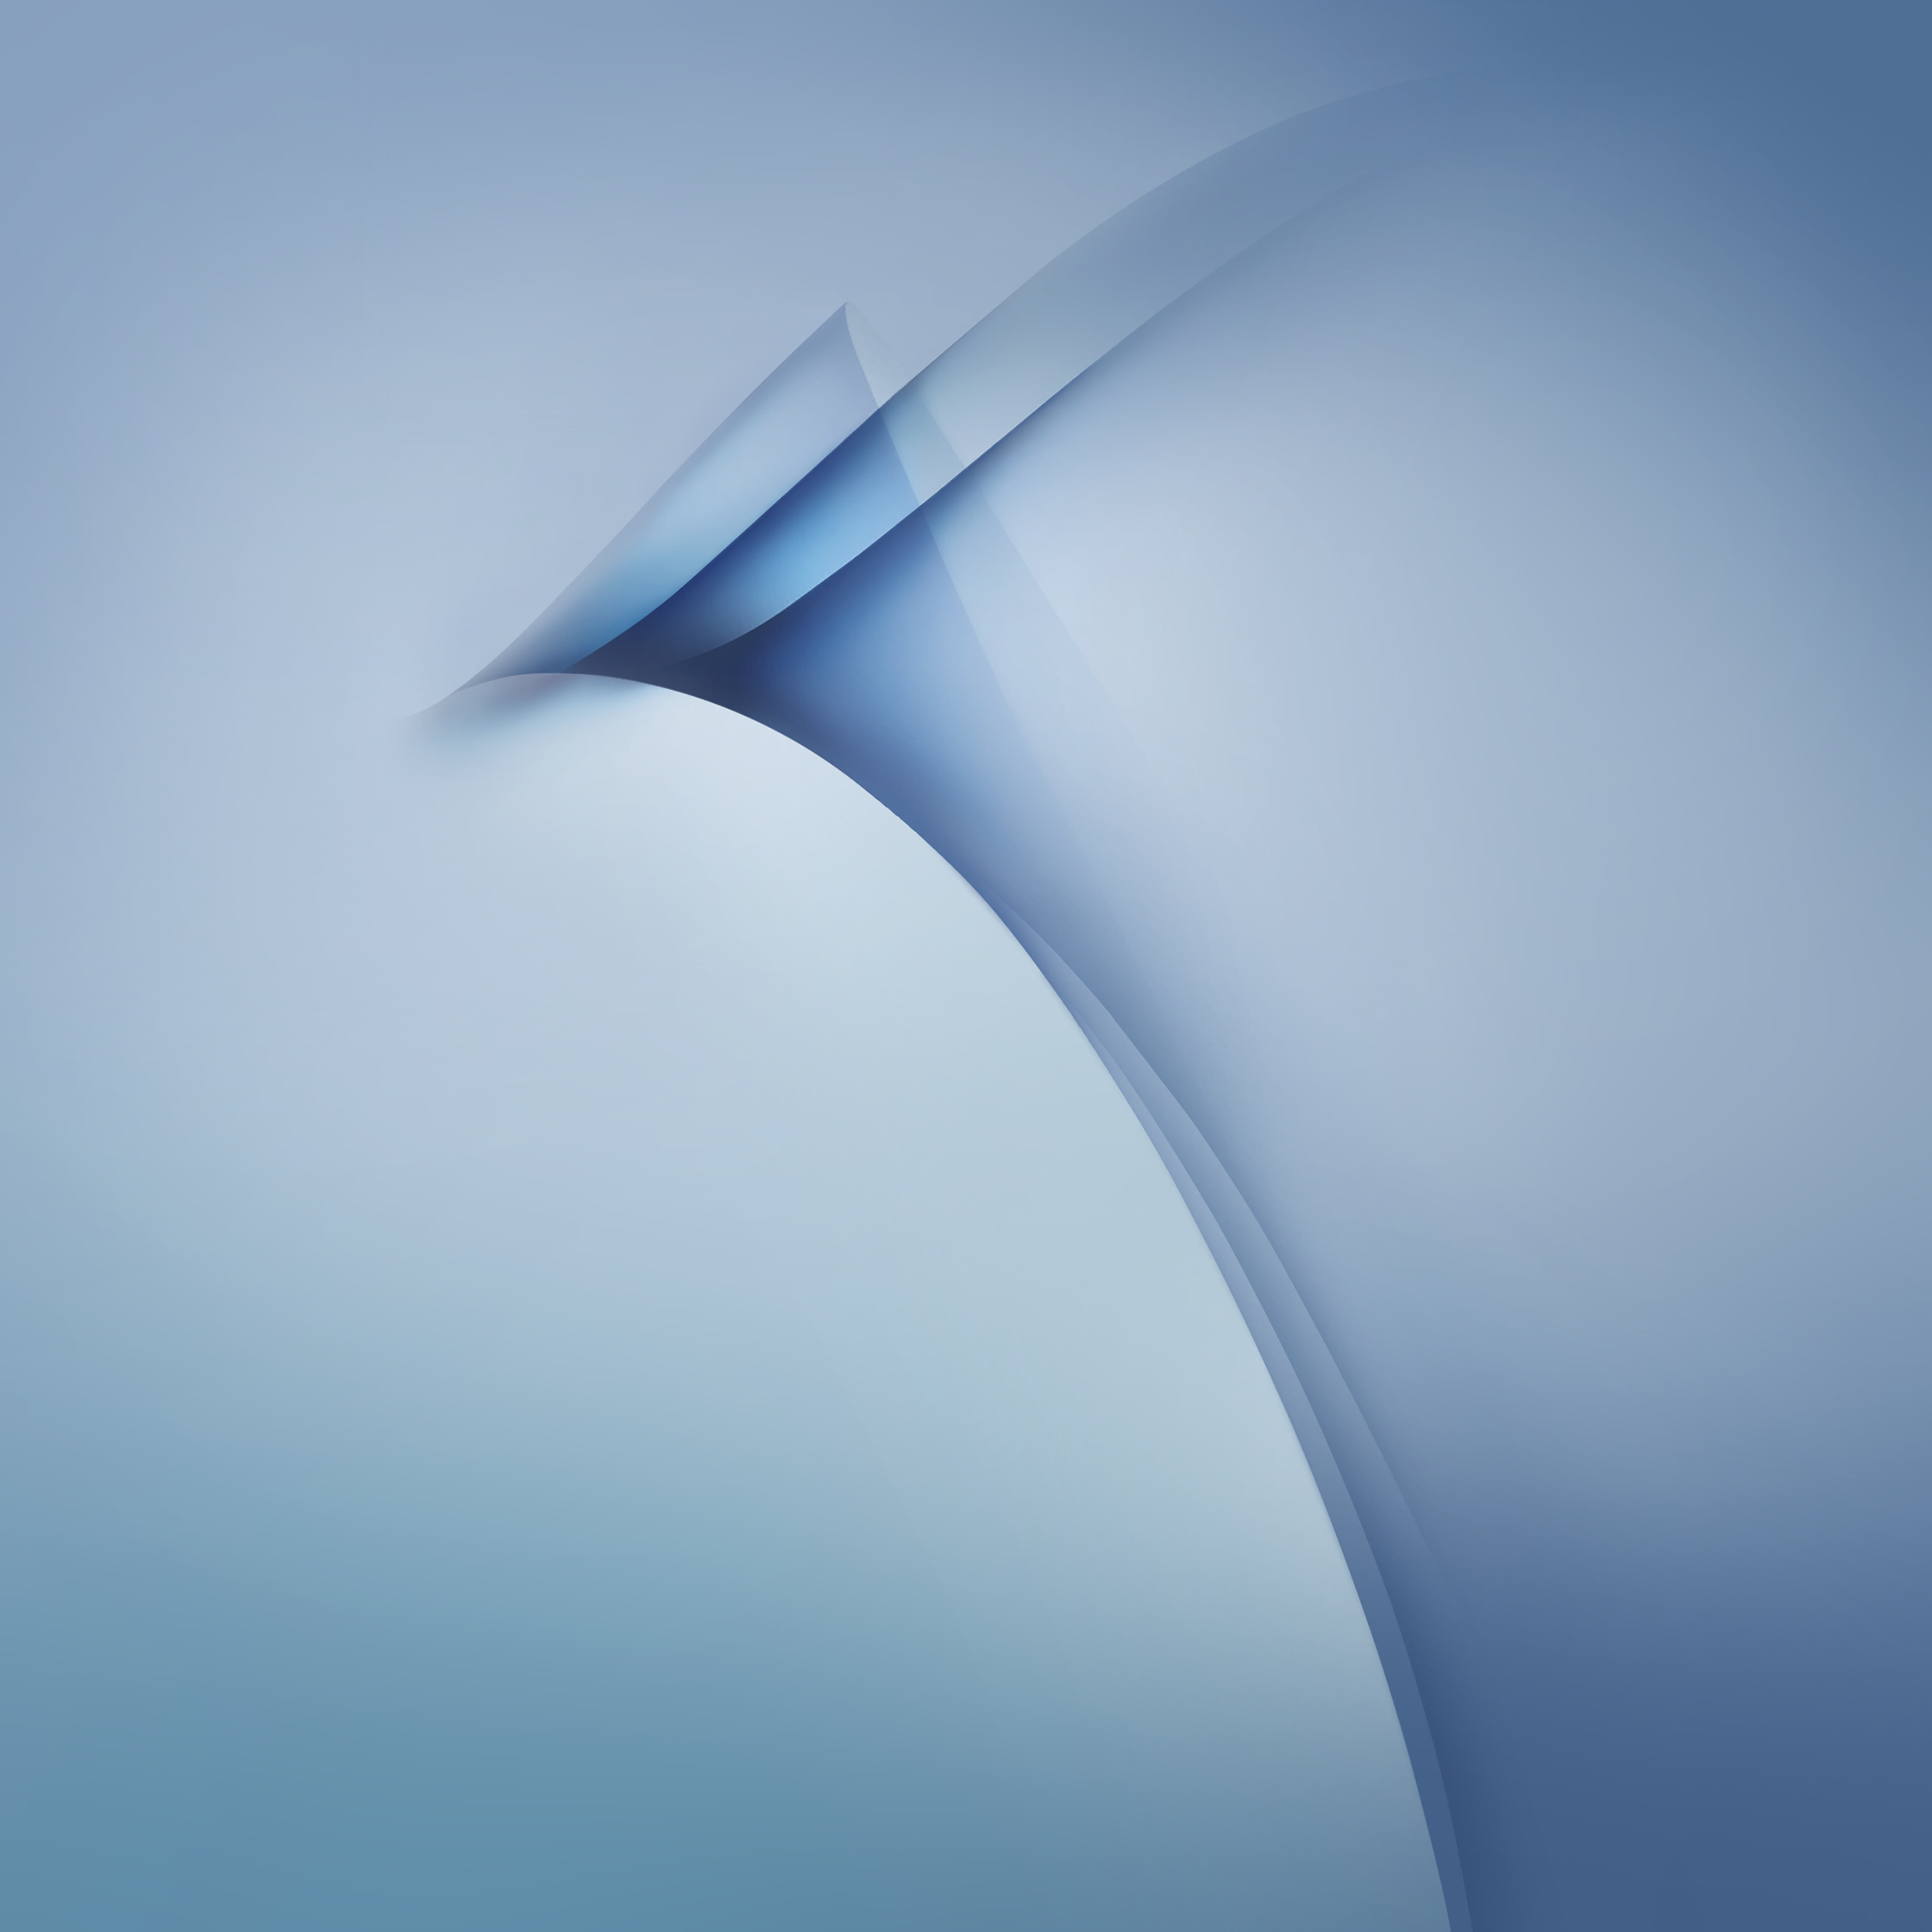 Gut bekannt Galaxy S7 : les fonds d'écran en téléchargement - FrAndroid NY05